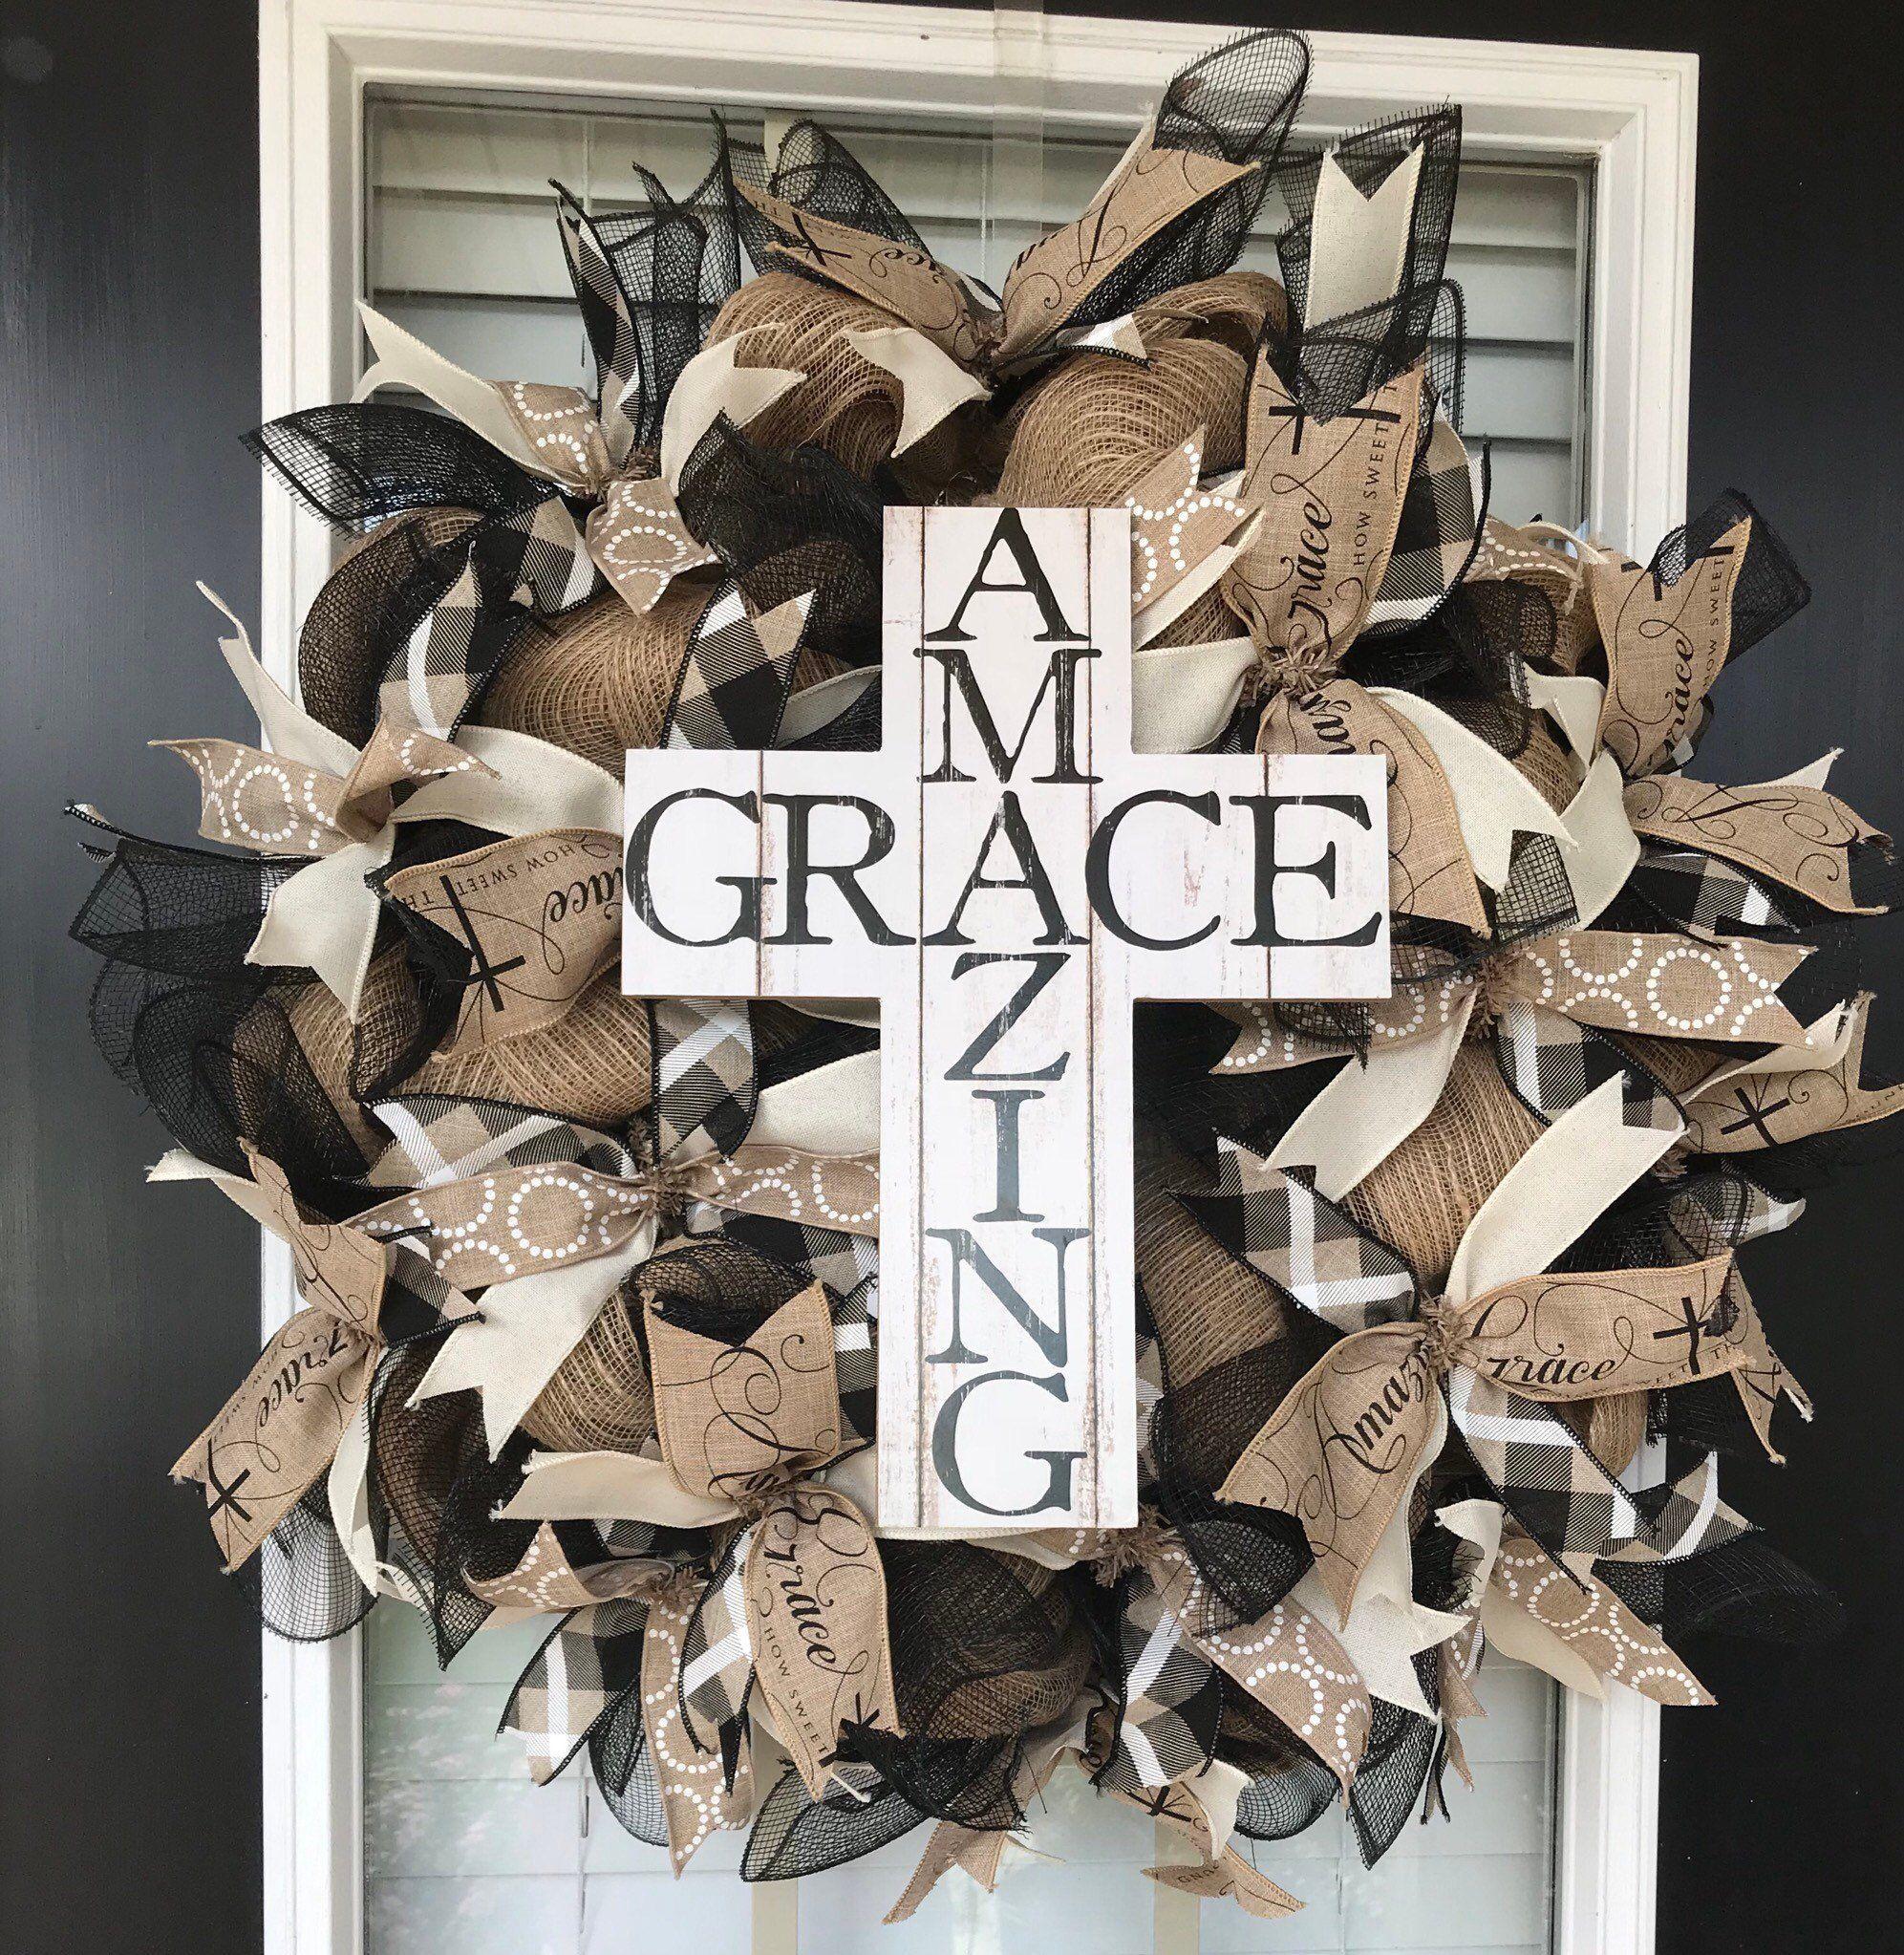 Photo of Everyday wreath, year round wreath, front door decor, everyday decor, wreath for the front door, Amazing Grace wreath, front door wreath